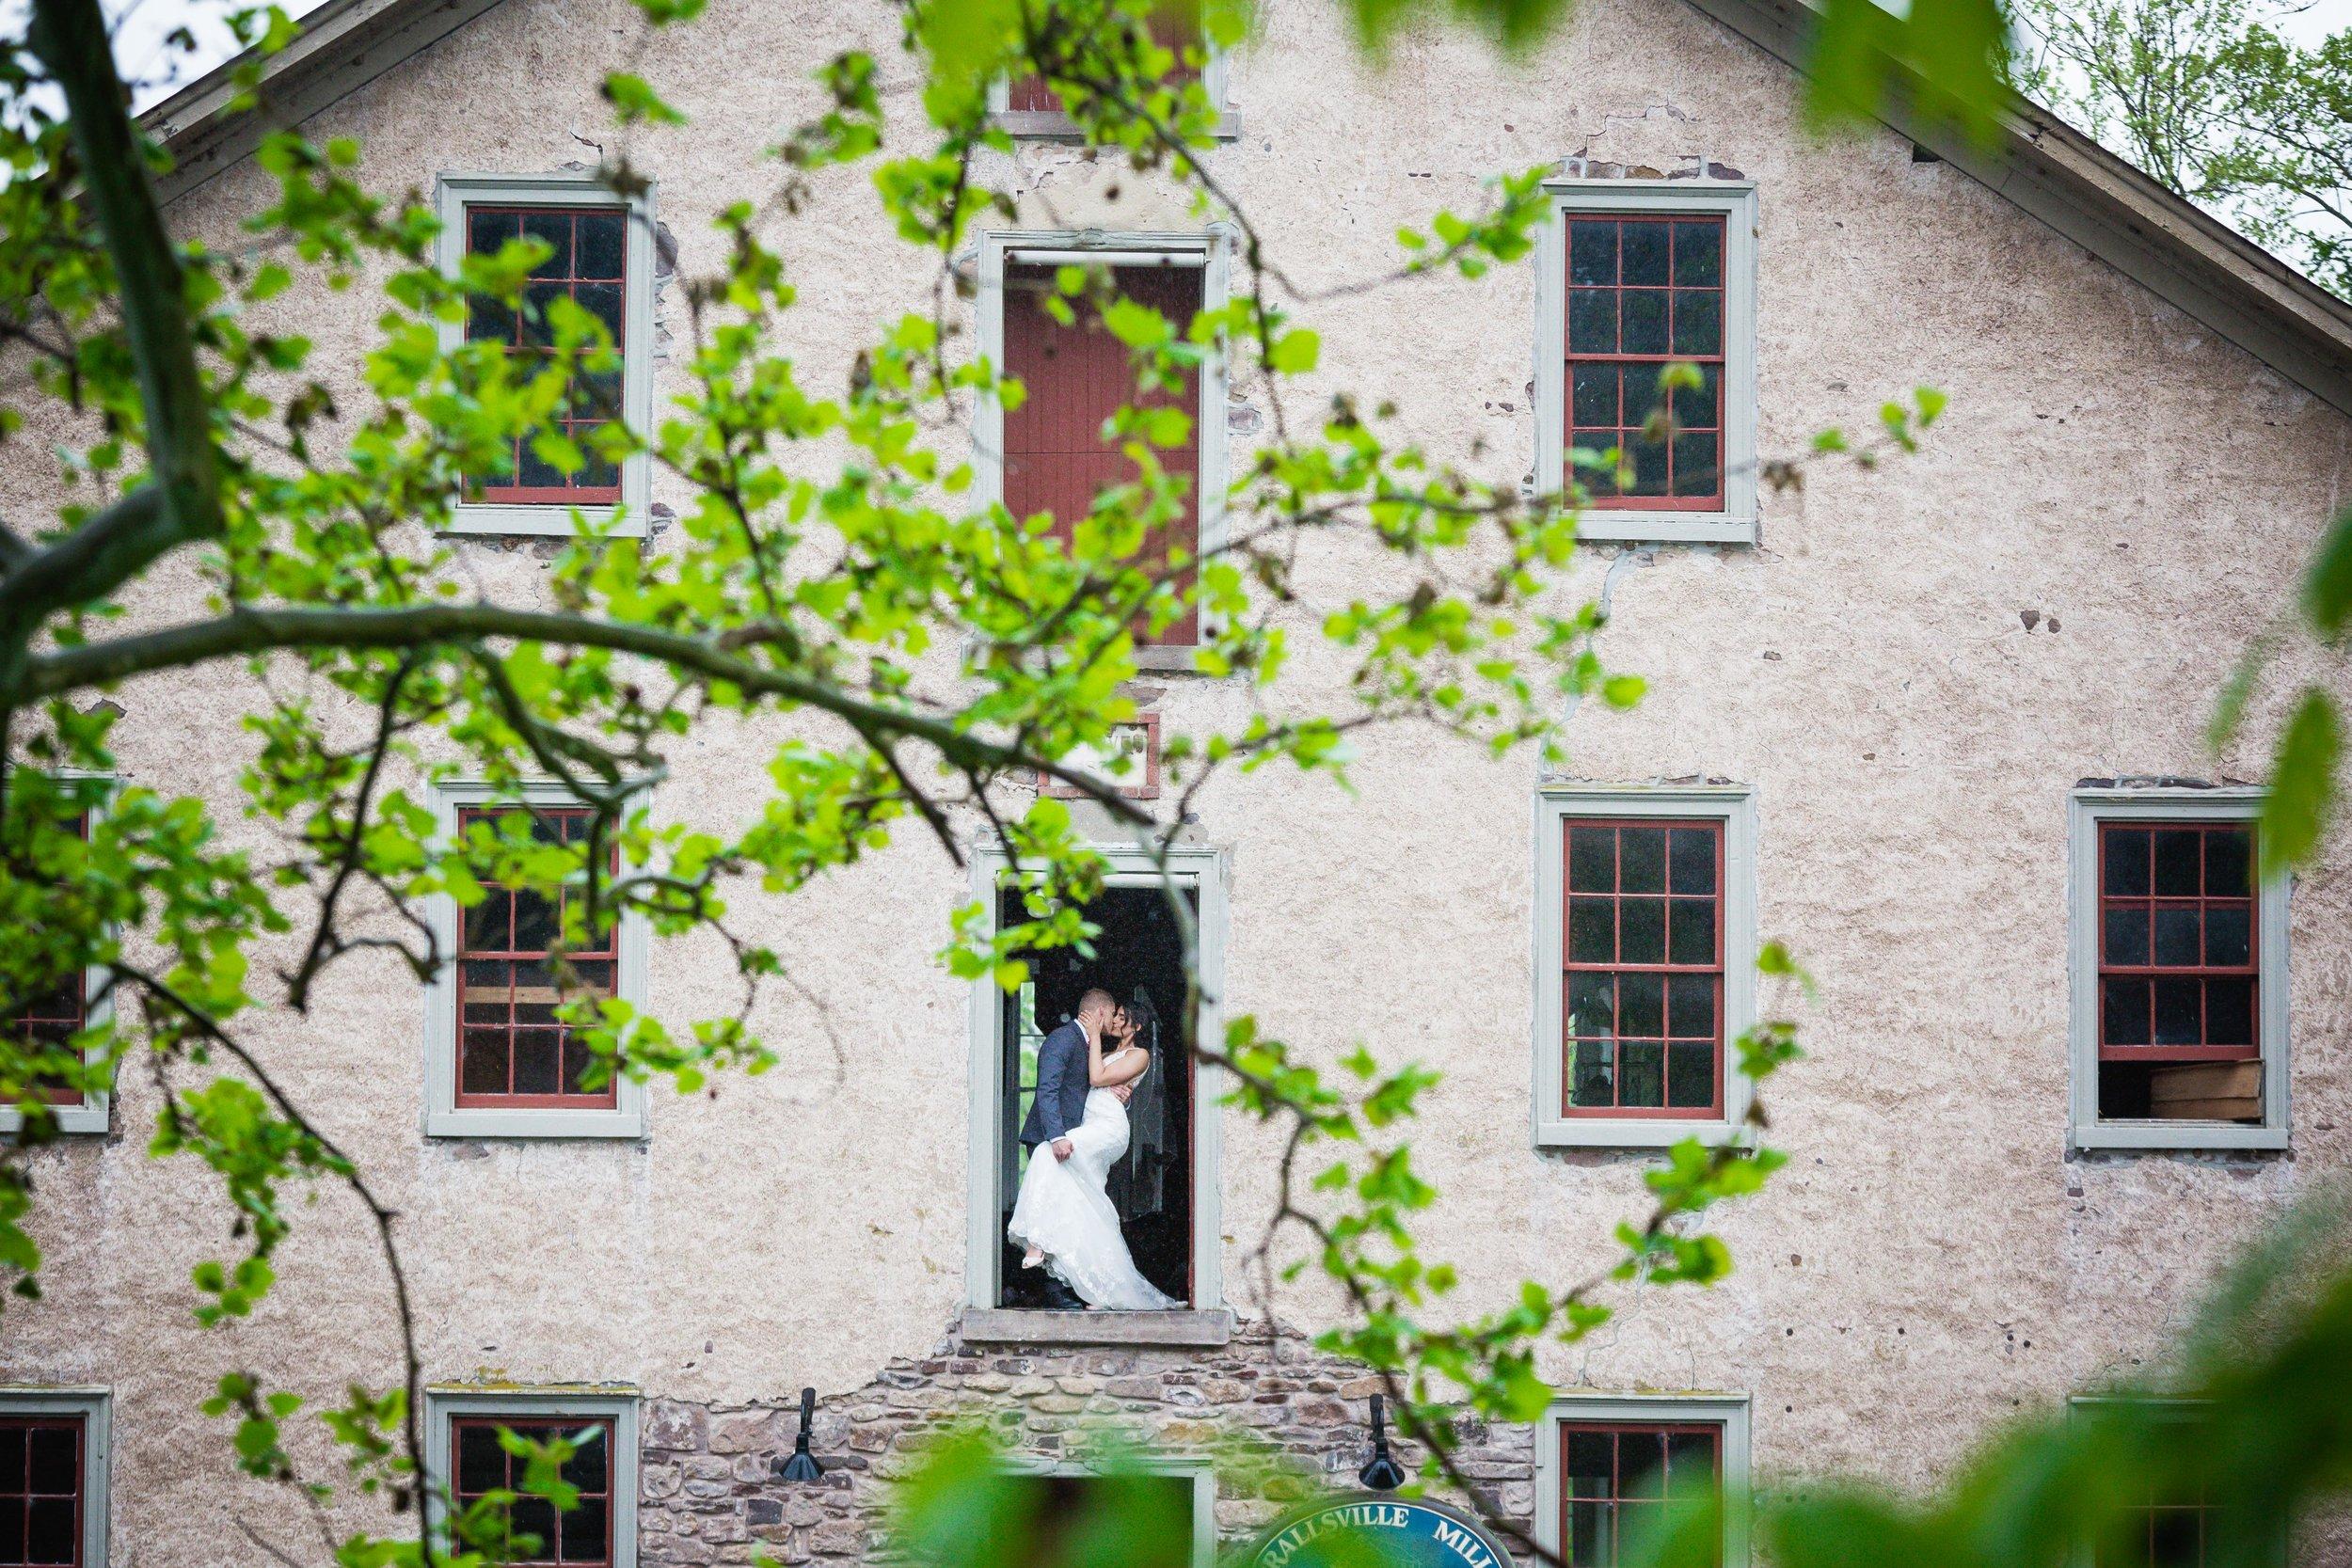 PRALLISVILLE MILLS NEW HOPE WEDDING PHOTOGRAPHY-88.jpg